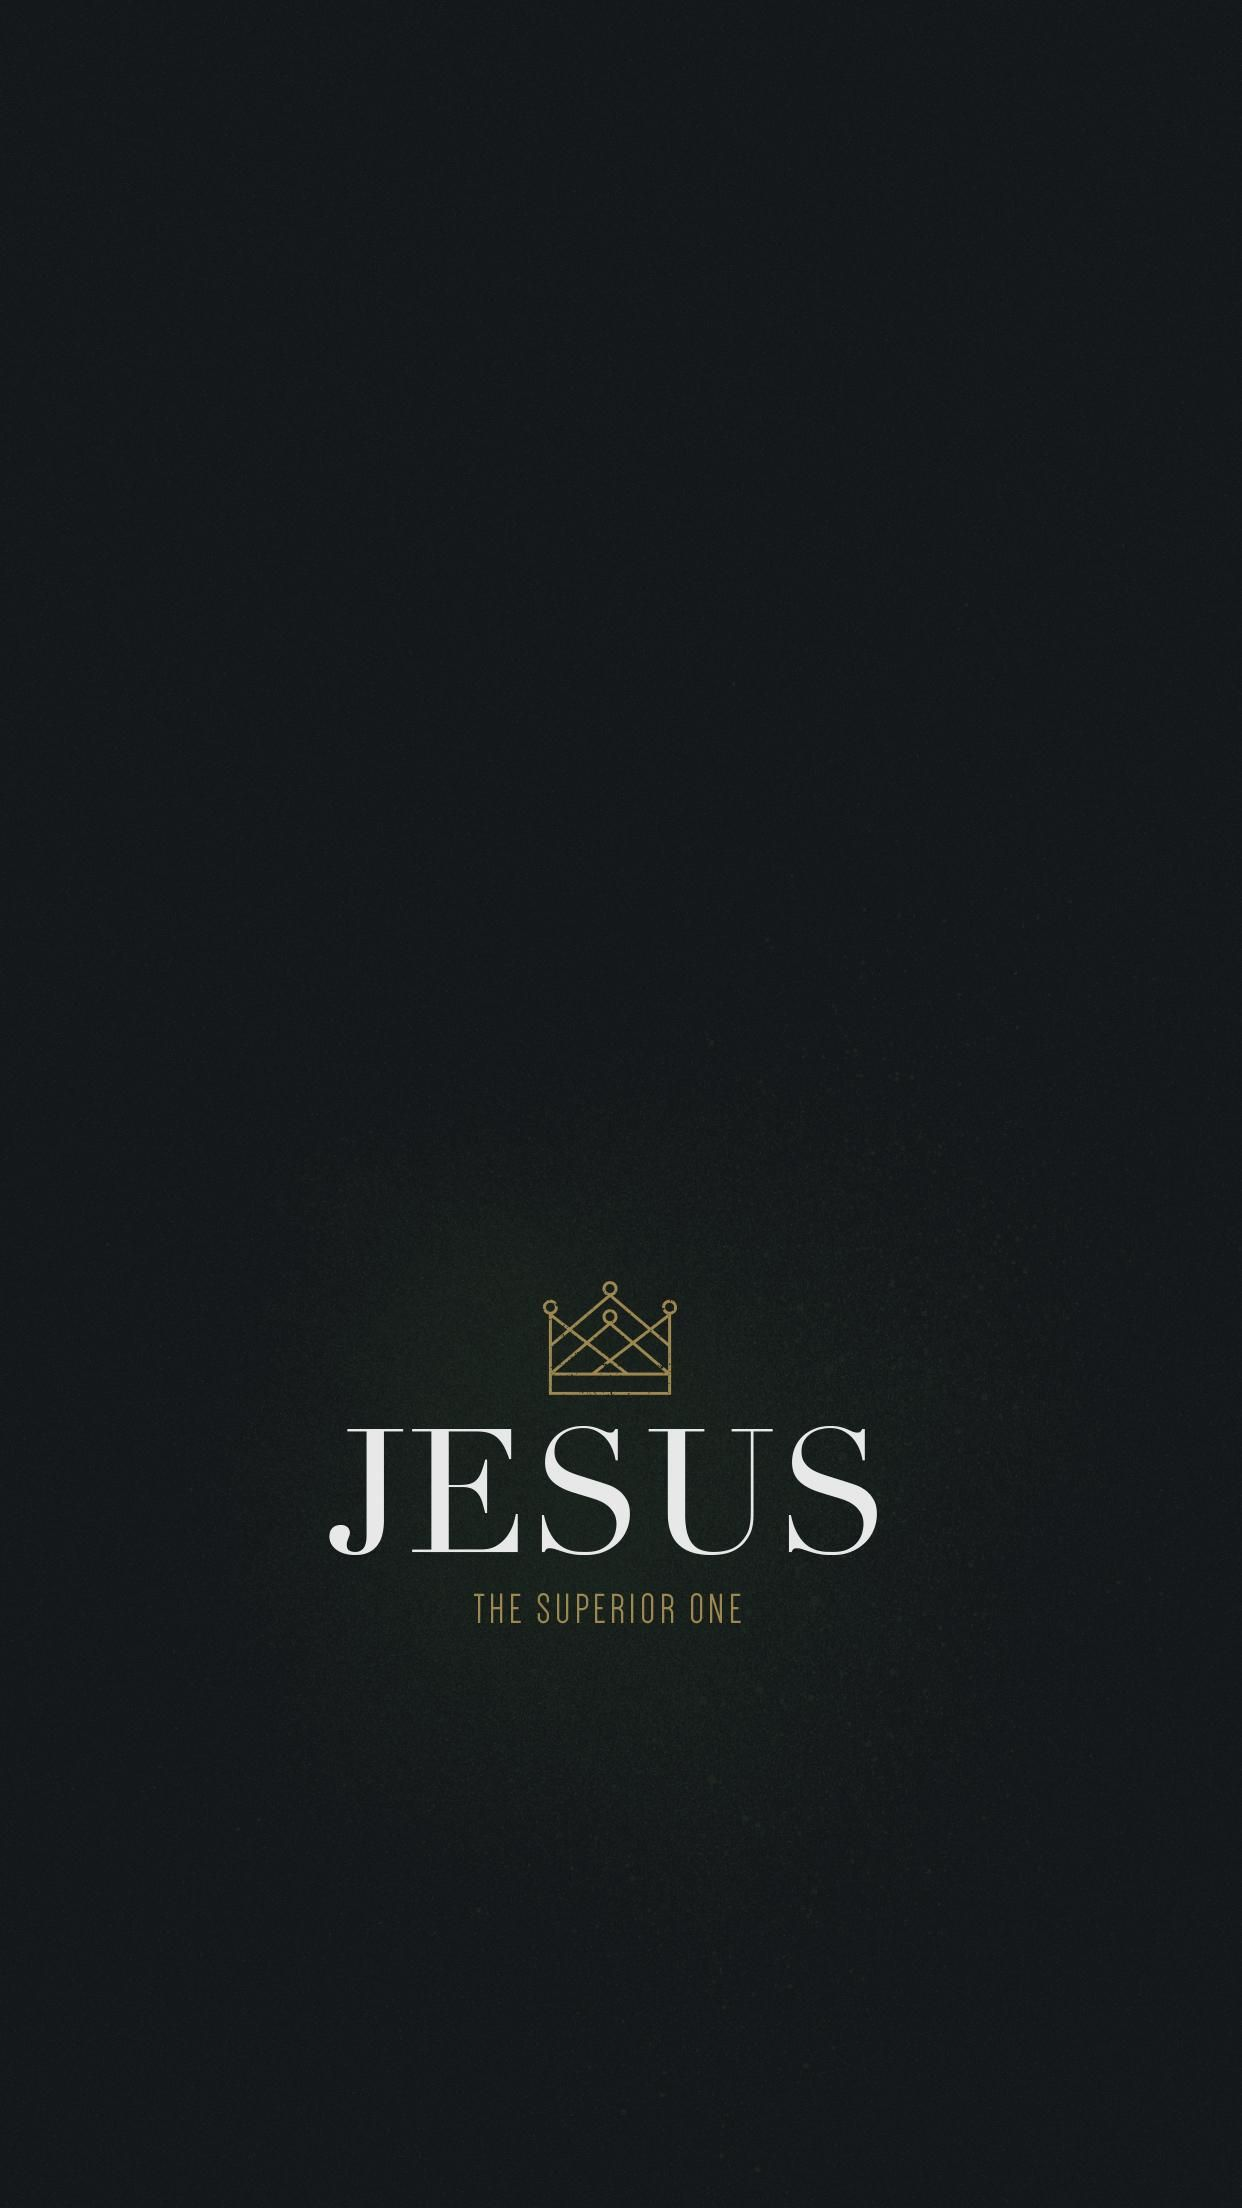 Jesus Phone Wallpapers Top Free Jesus Phone Backgrounds Wallpaperaccess